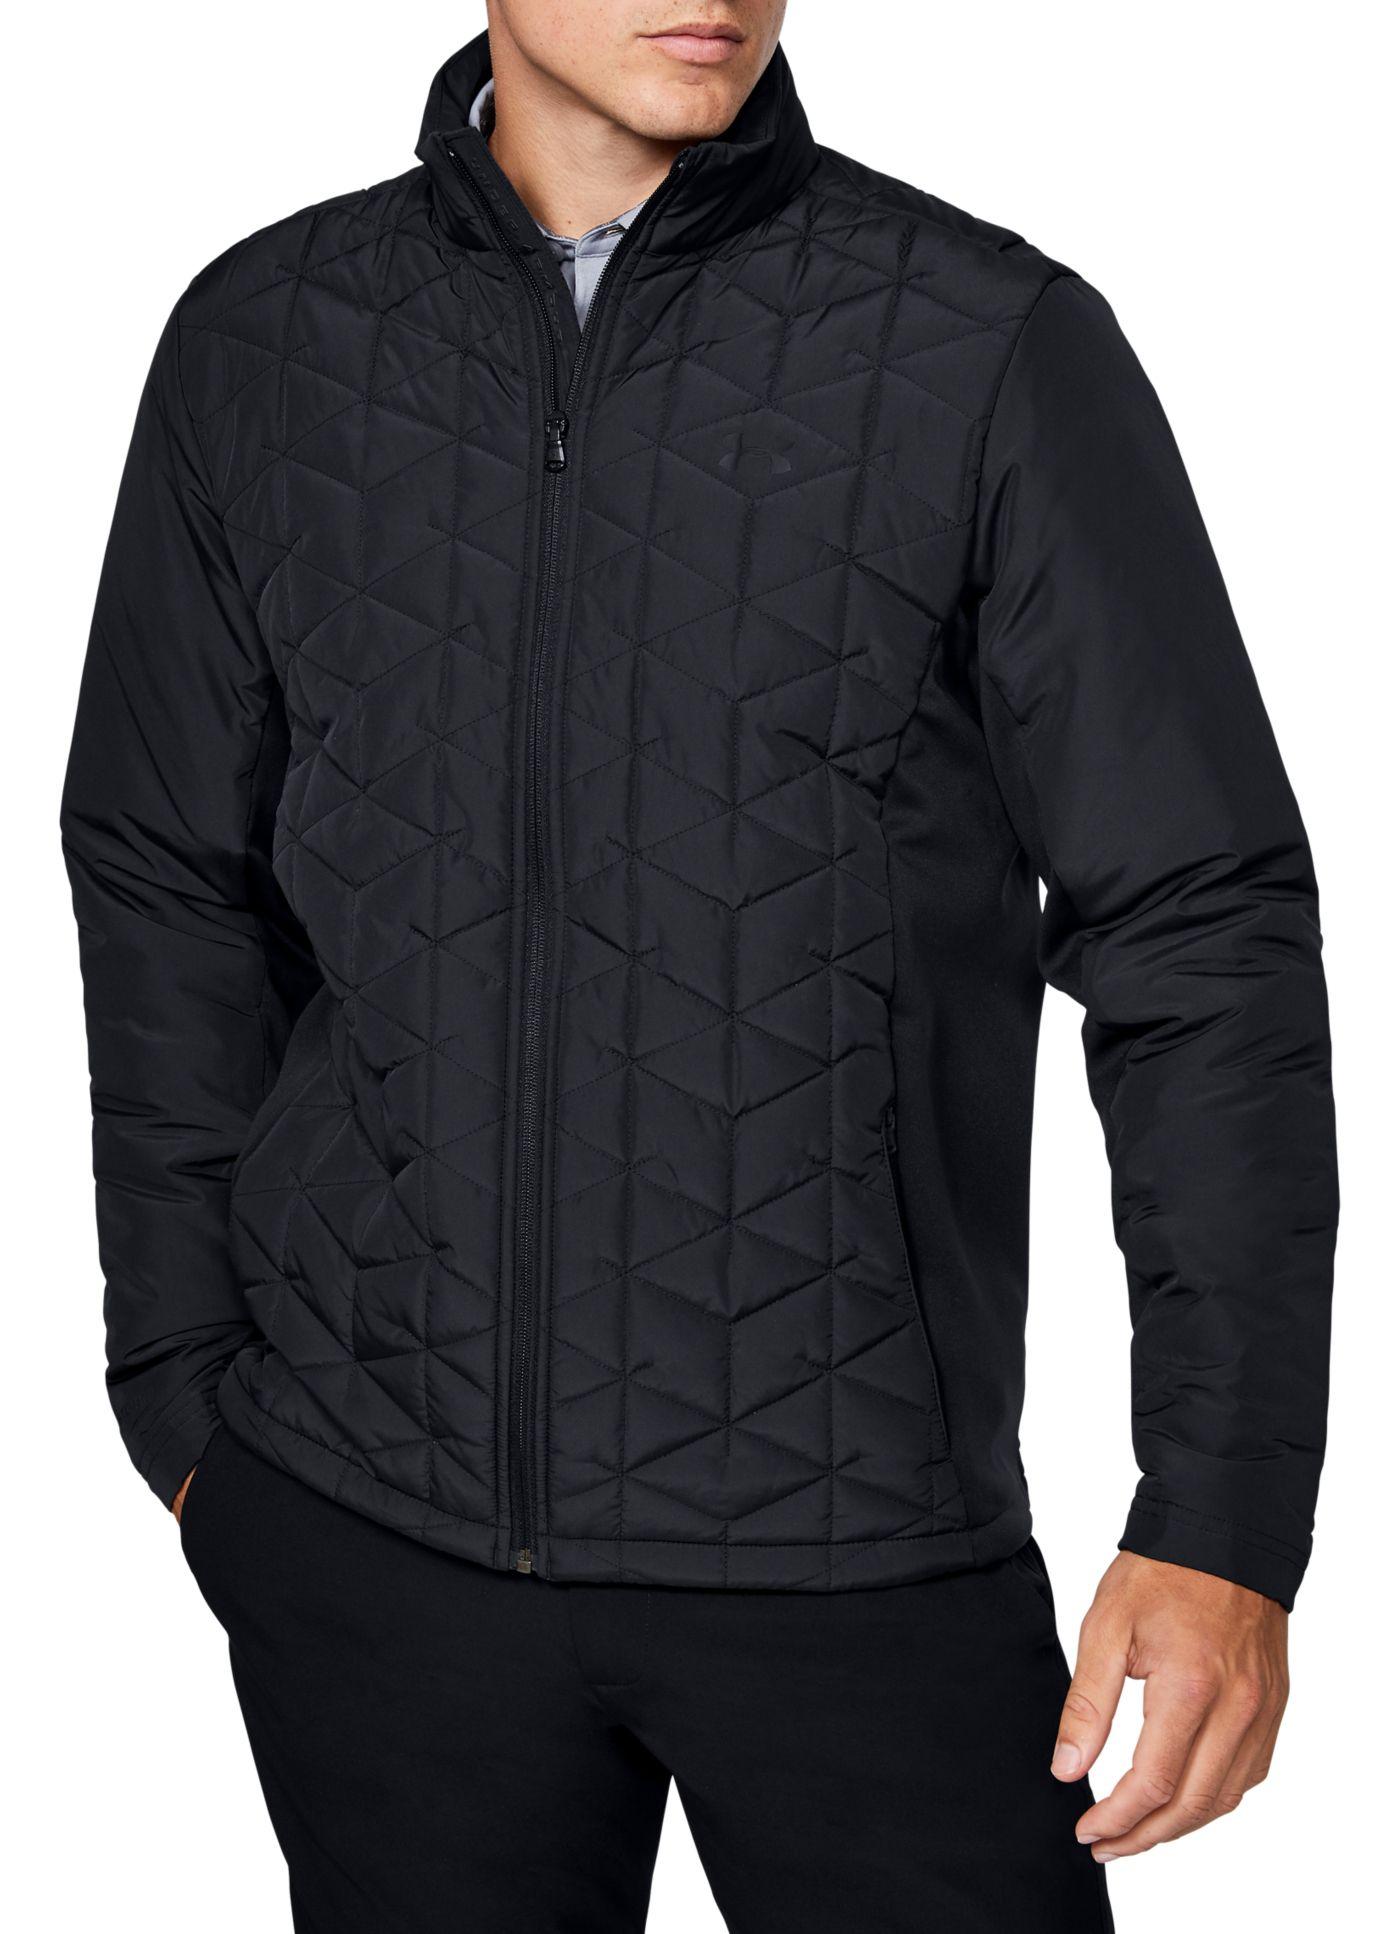 Under Armour Men's Reactor Elements Hybrid Golf Jacket